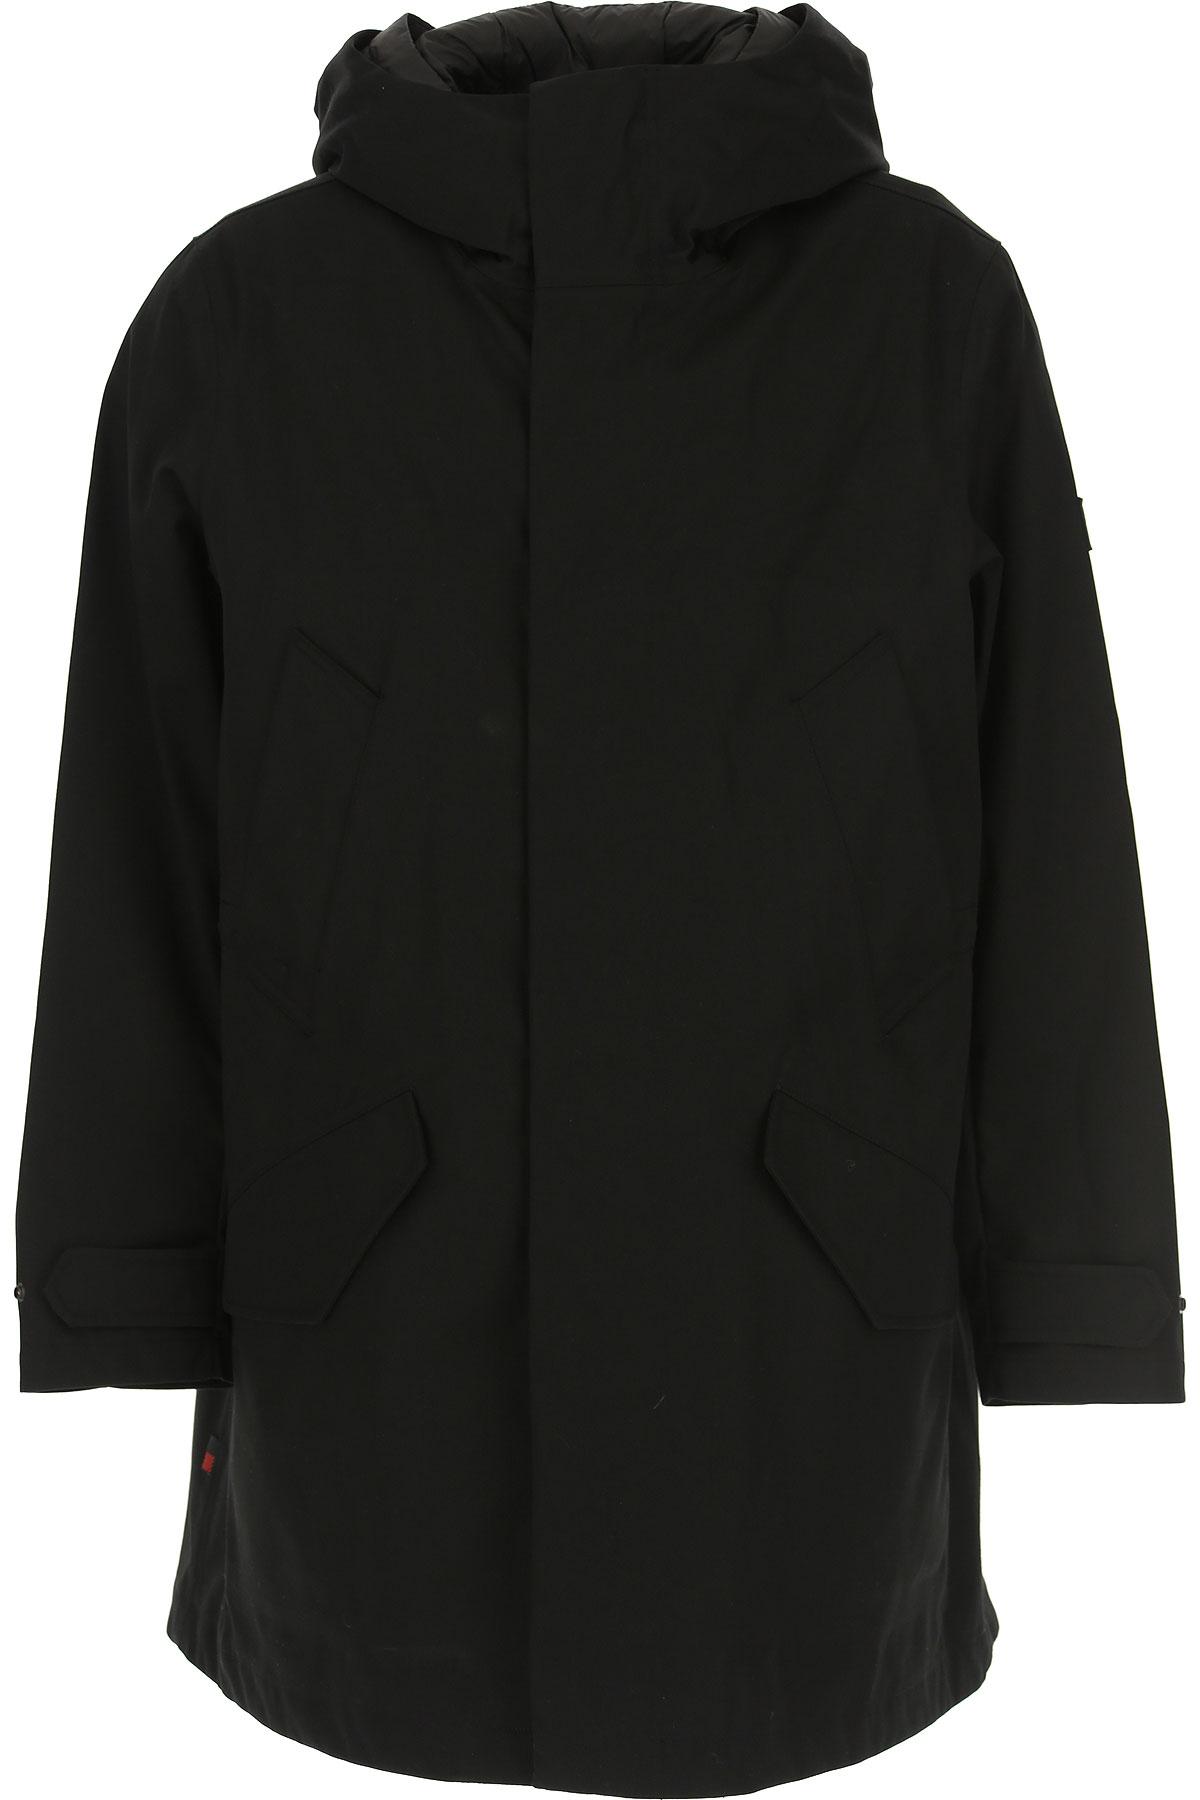 Woolrich Down Jacket for Men, Puffer Ski Jacket, Black, polyester, 2019, L M